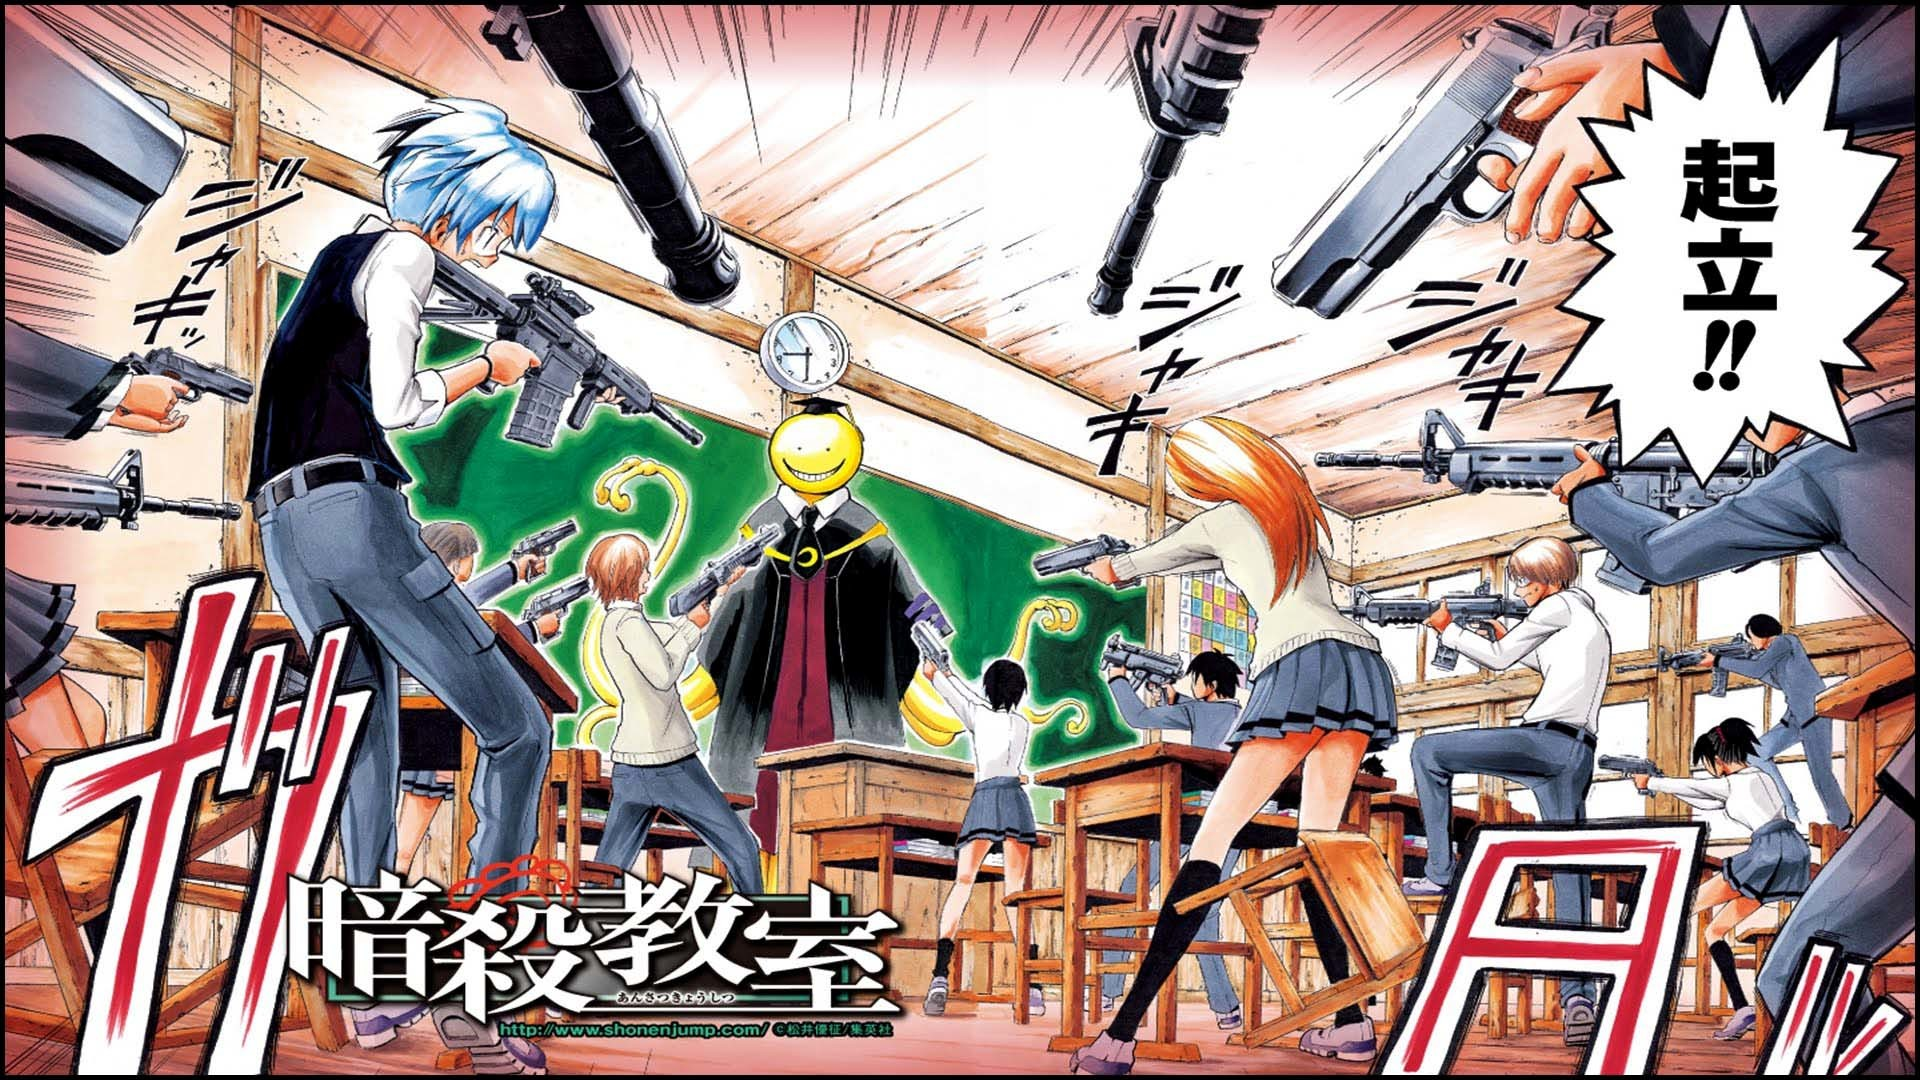 Ansatsu Kyoushitsu Assasination Classroom Anime Wallpaper